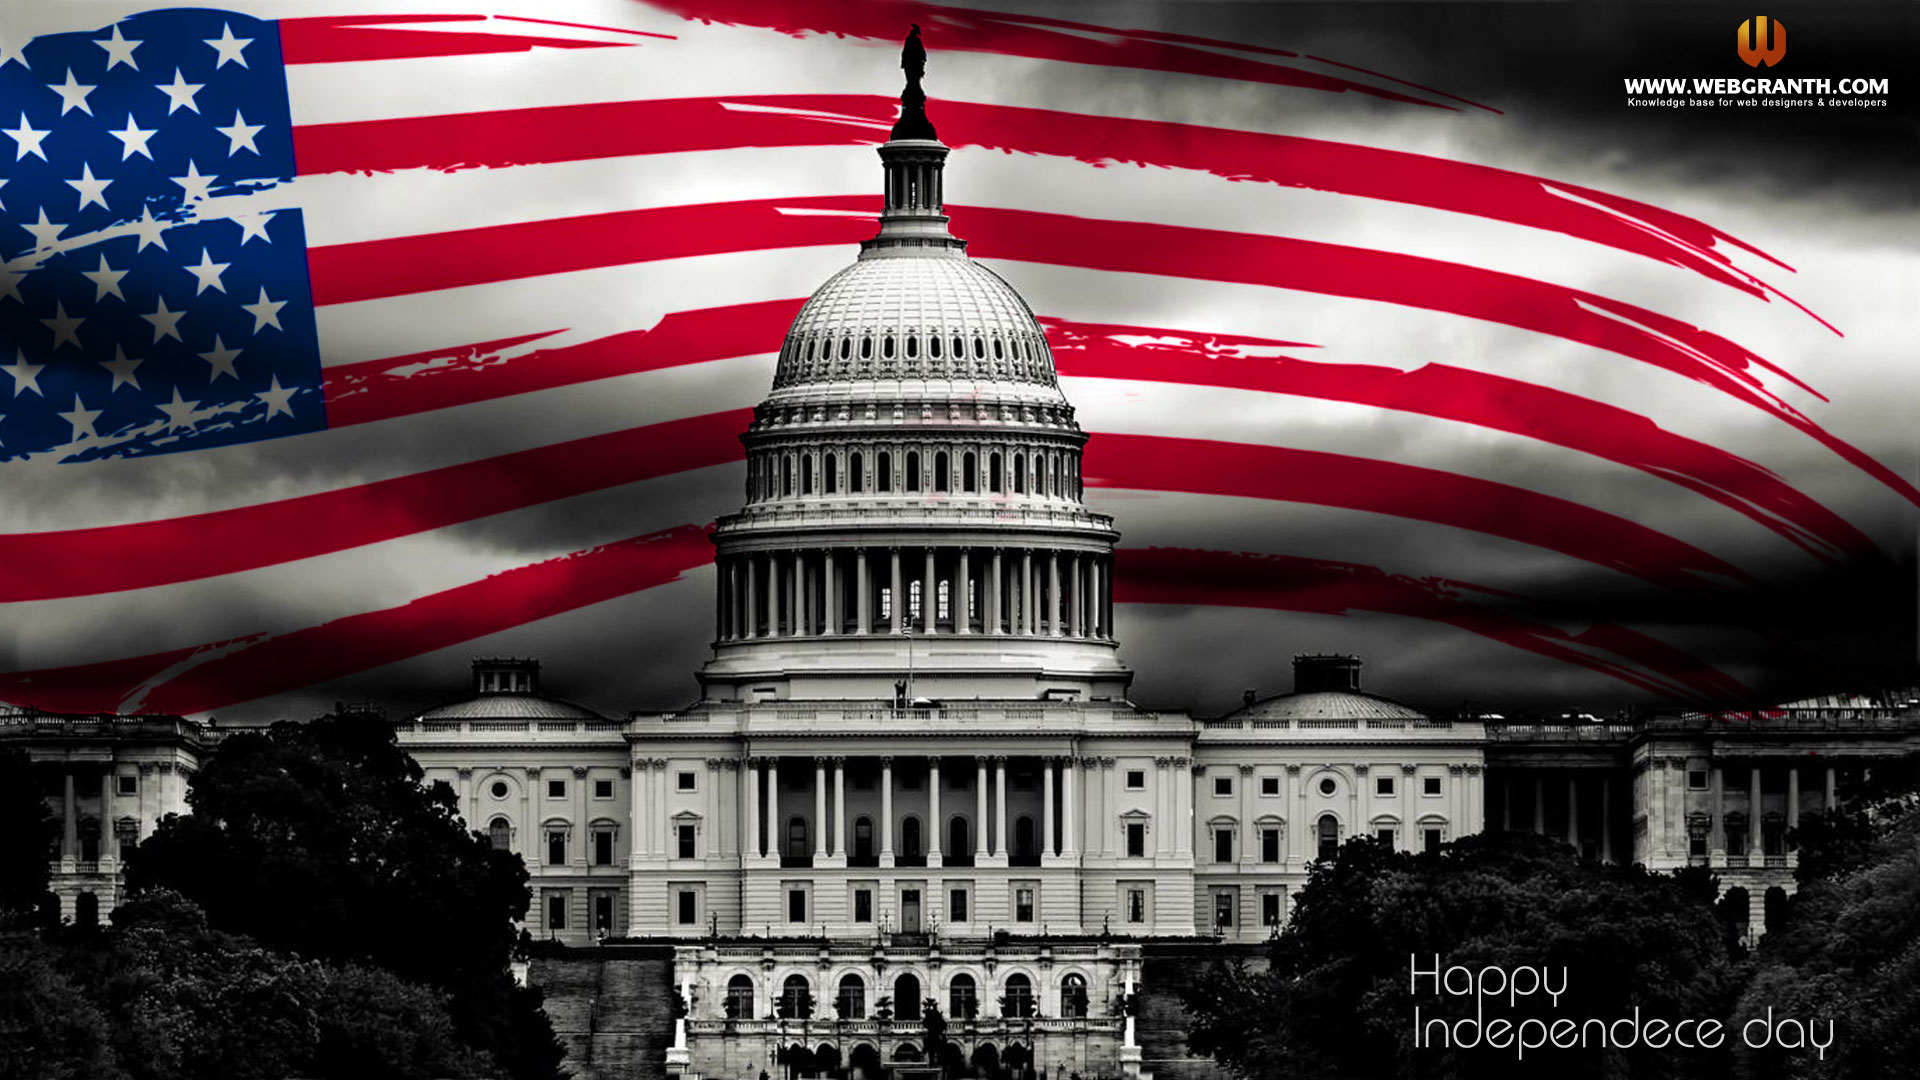 Best 40 United States Congress Wallpaper on HipWallpaper 1920x1080